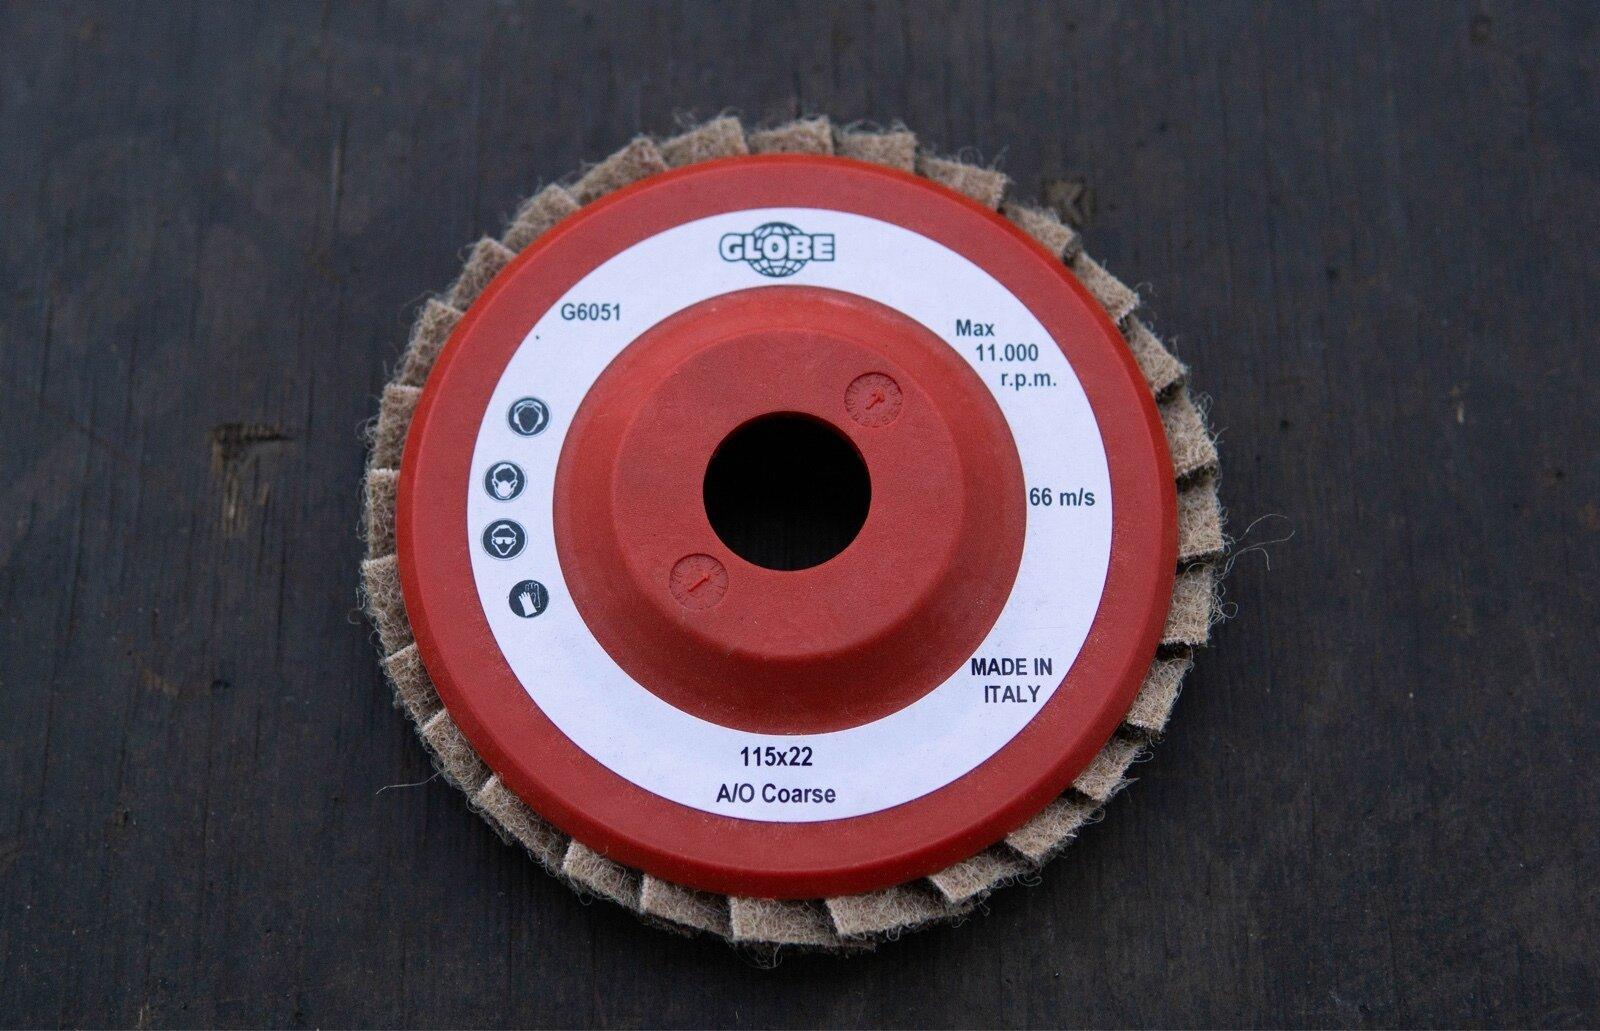 Абразивные круги GLOBE Scoth-Brite серии A/O - фото pic_3b14520598172b4ea834ca0c0258fc95_1920x9000_1.jpg